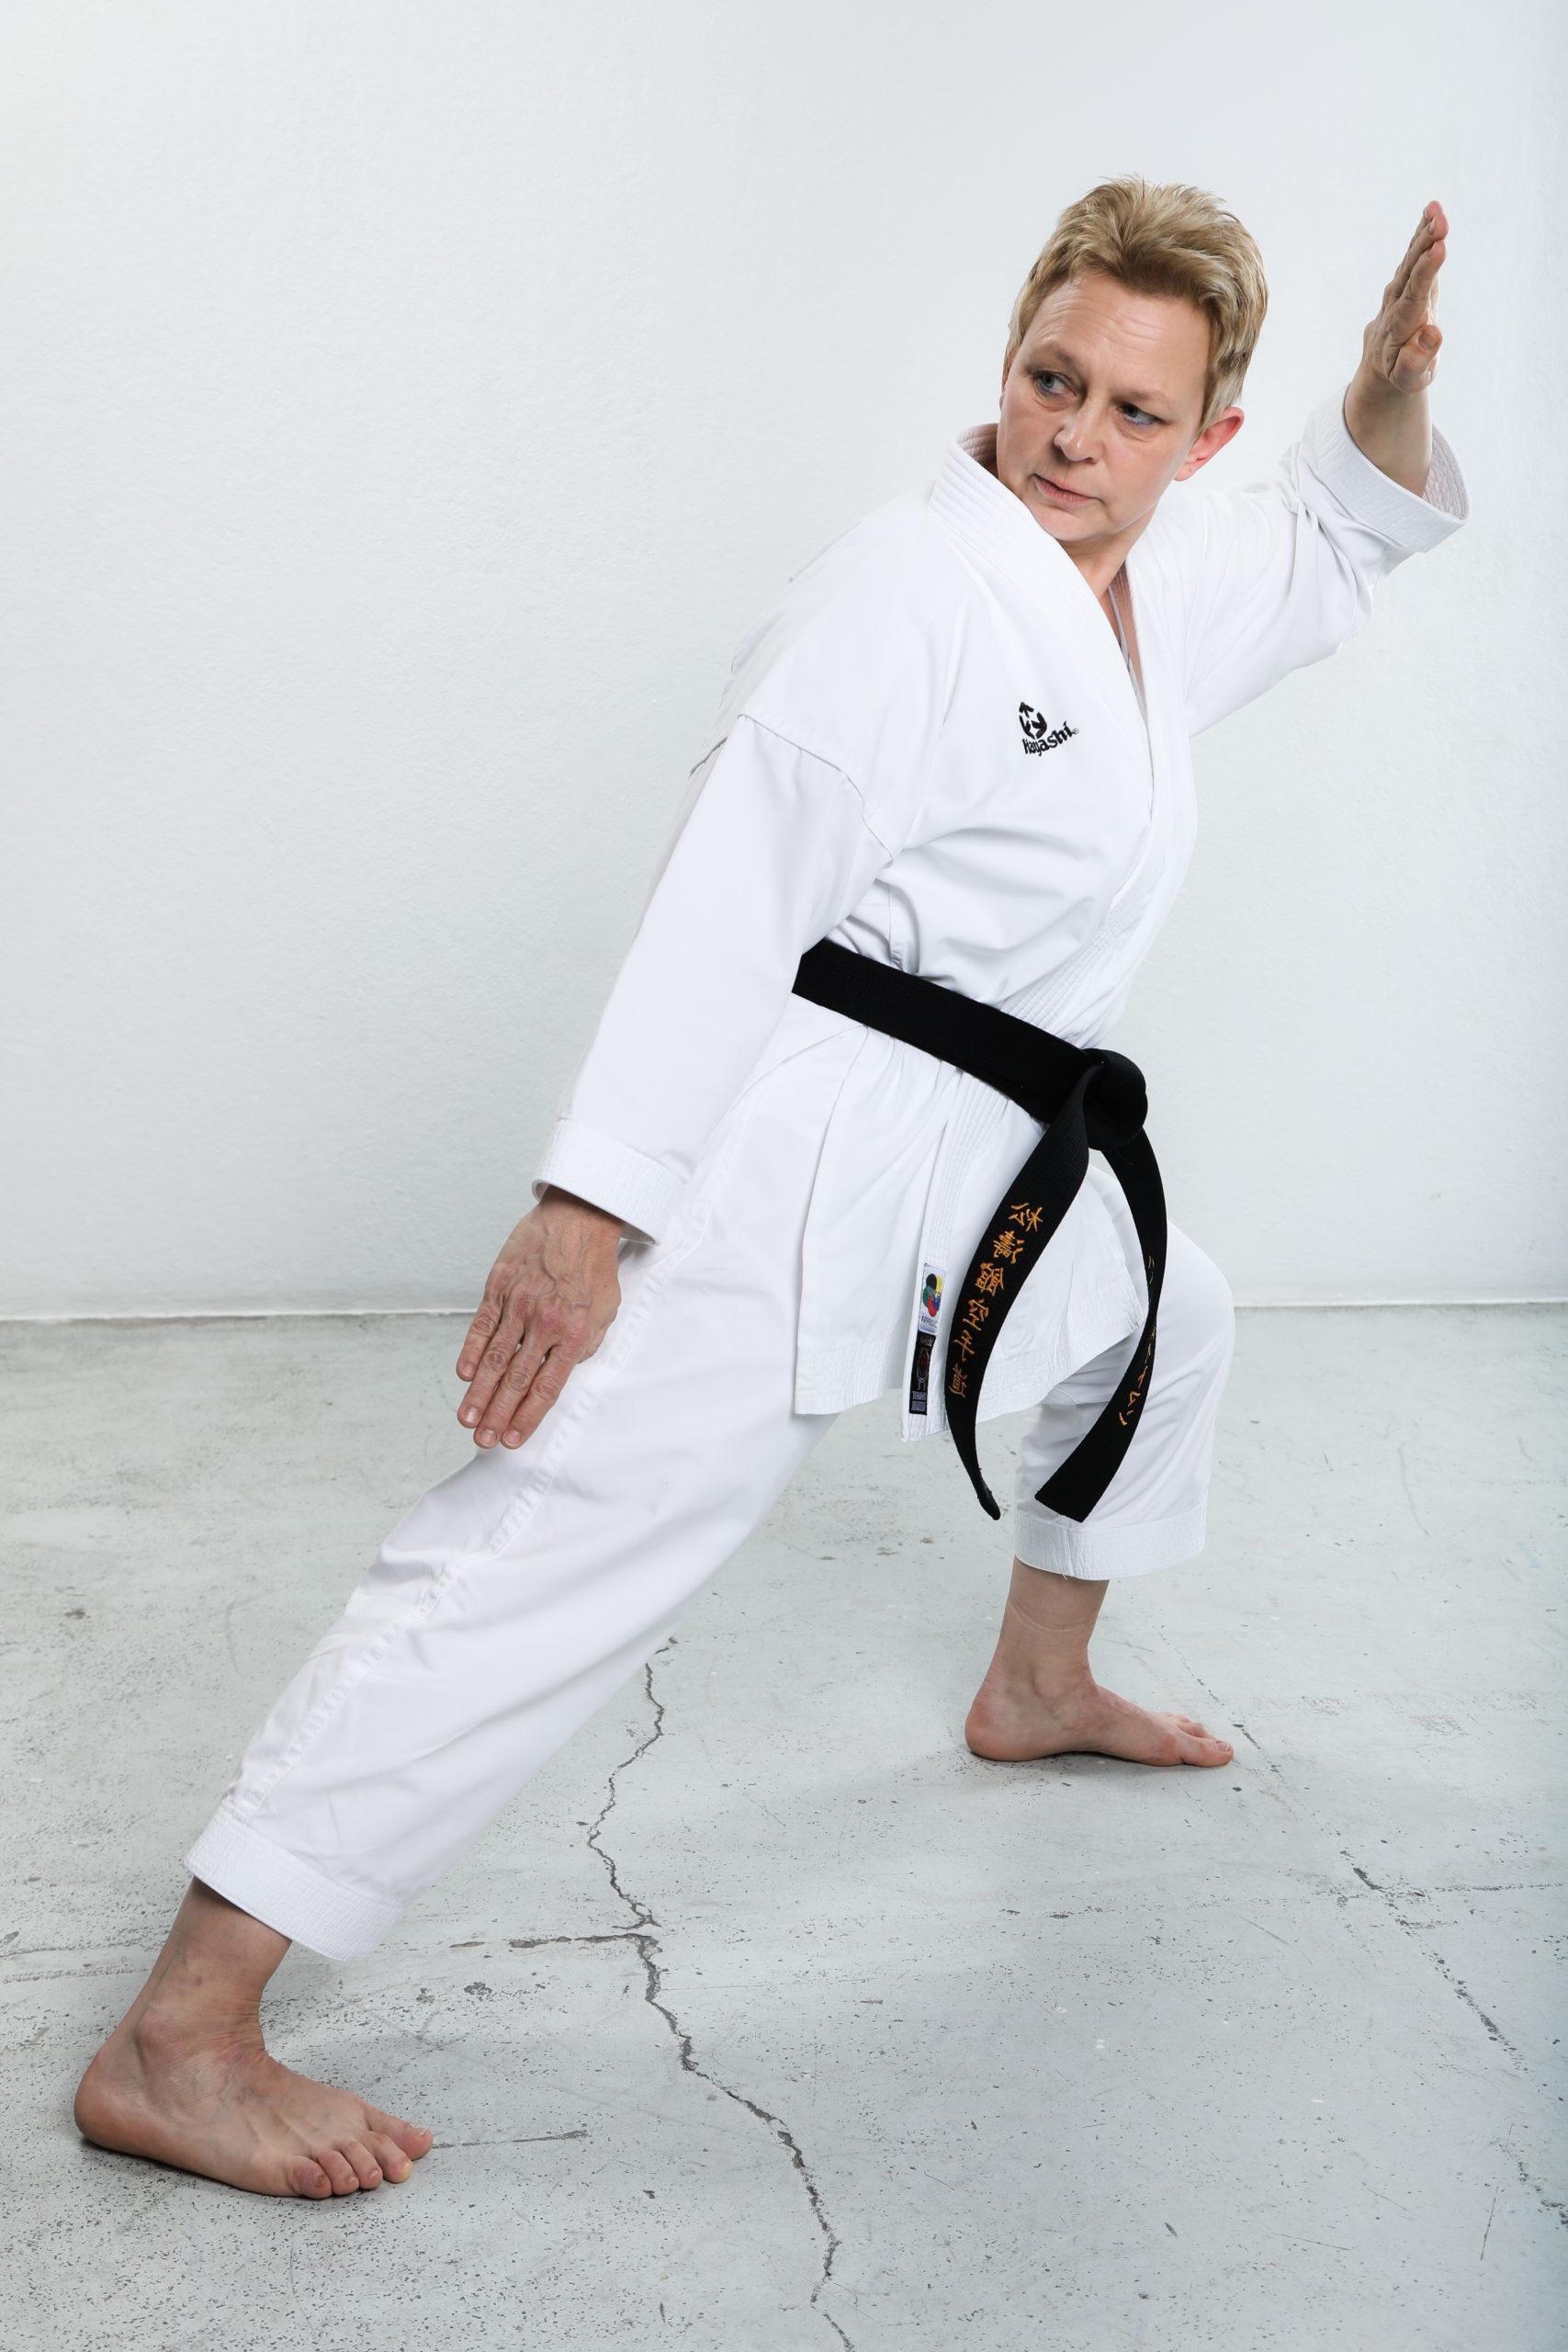 Karate Trainerin Heike Heitmann 1. Dan